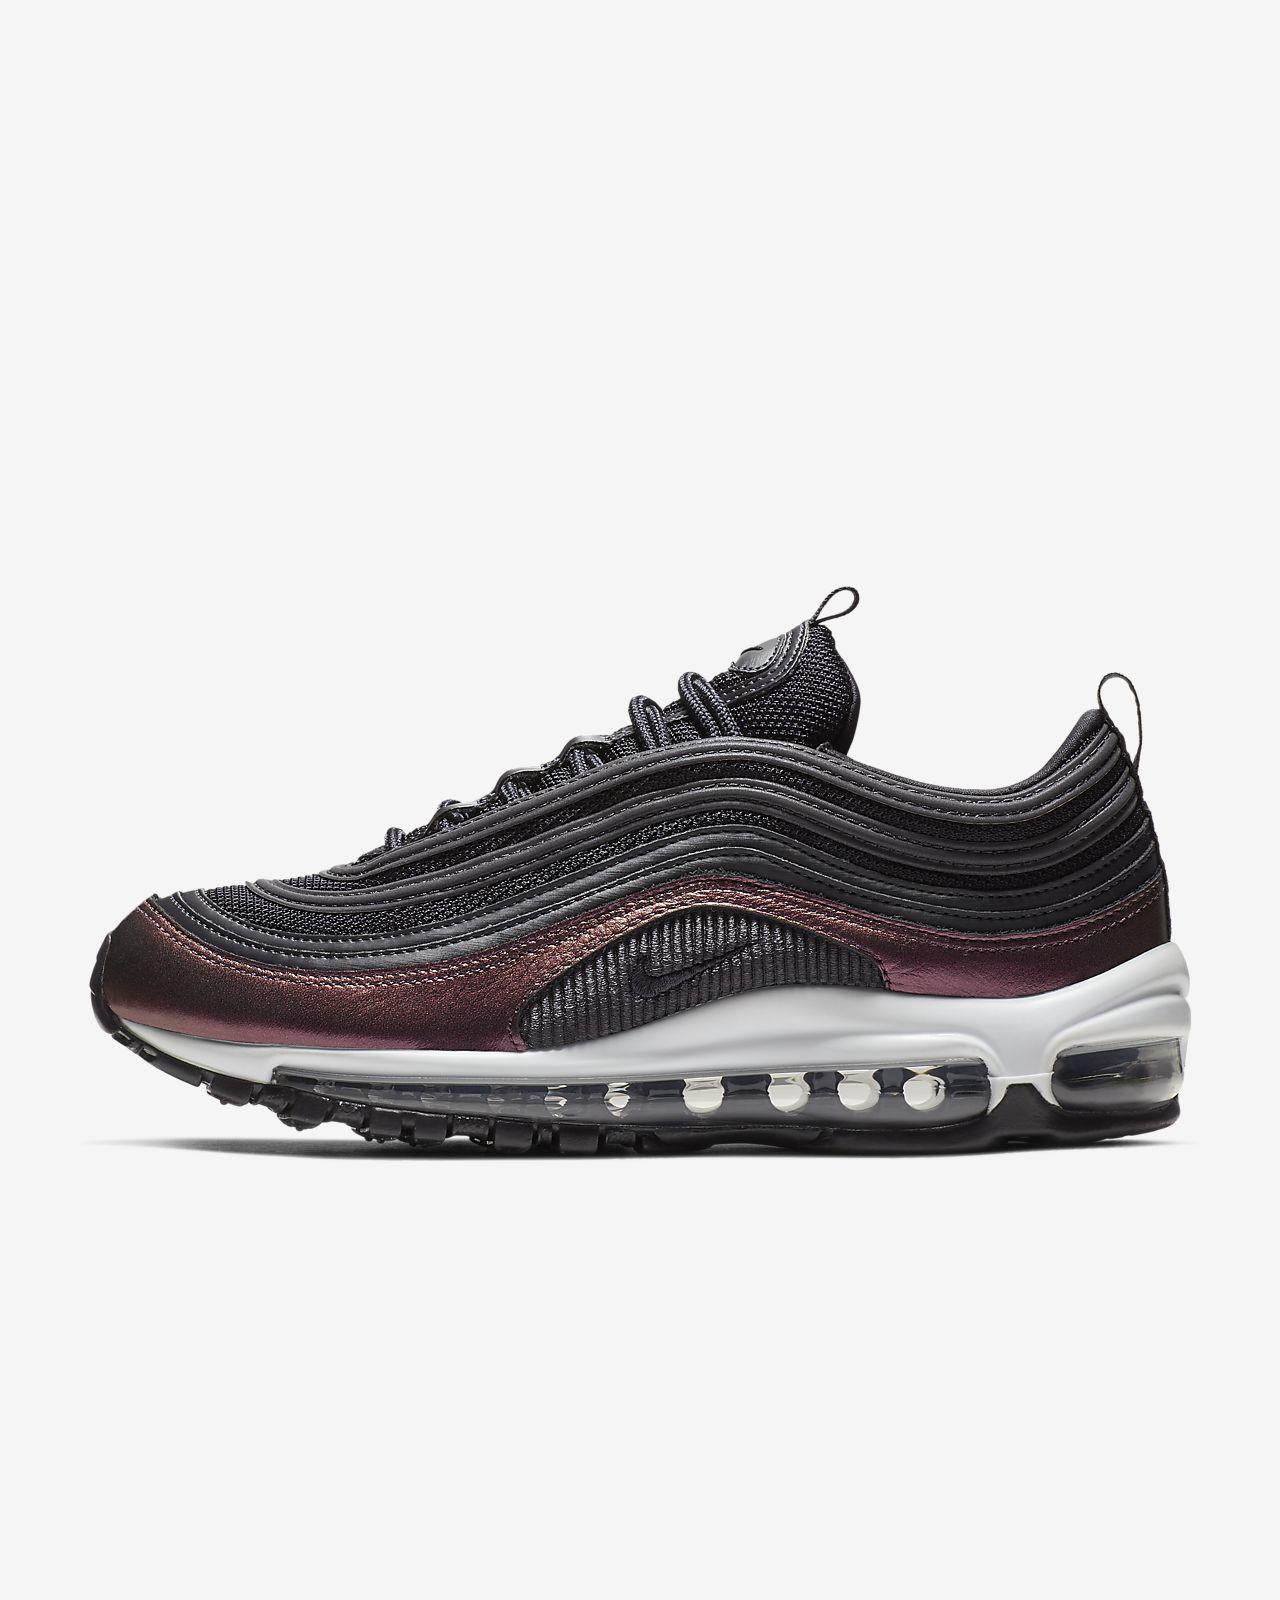 buy popular 8c1f8 e5897 ... Nike Air Max 97 SE-sko til kvinder